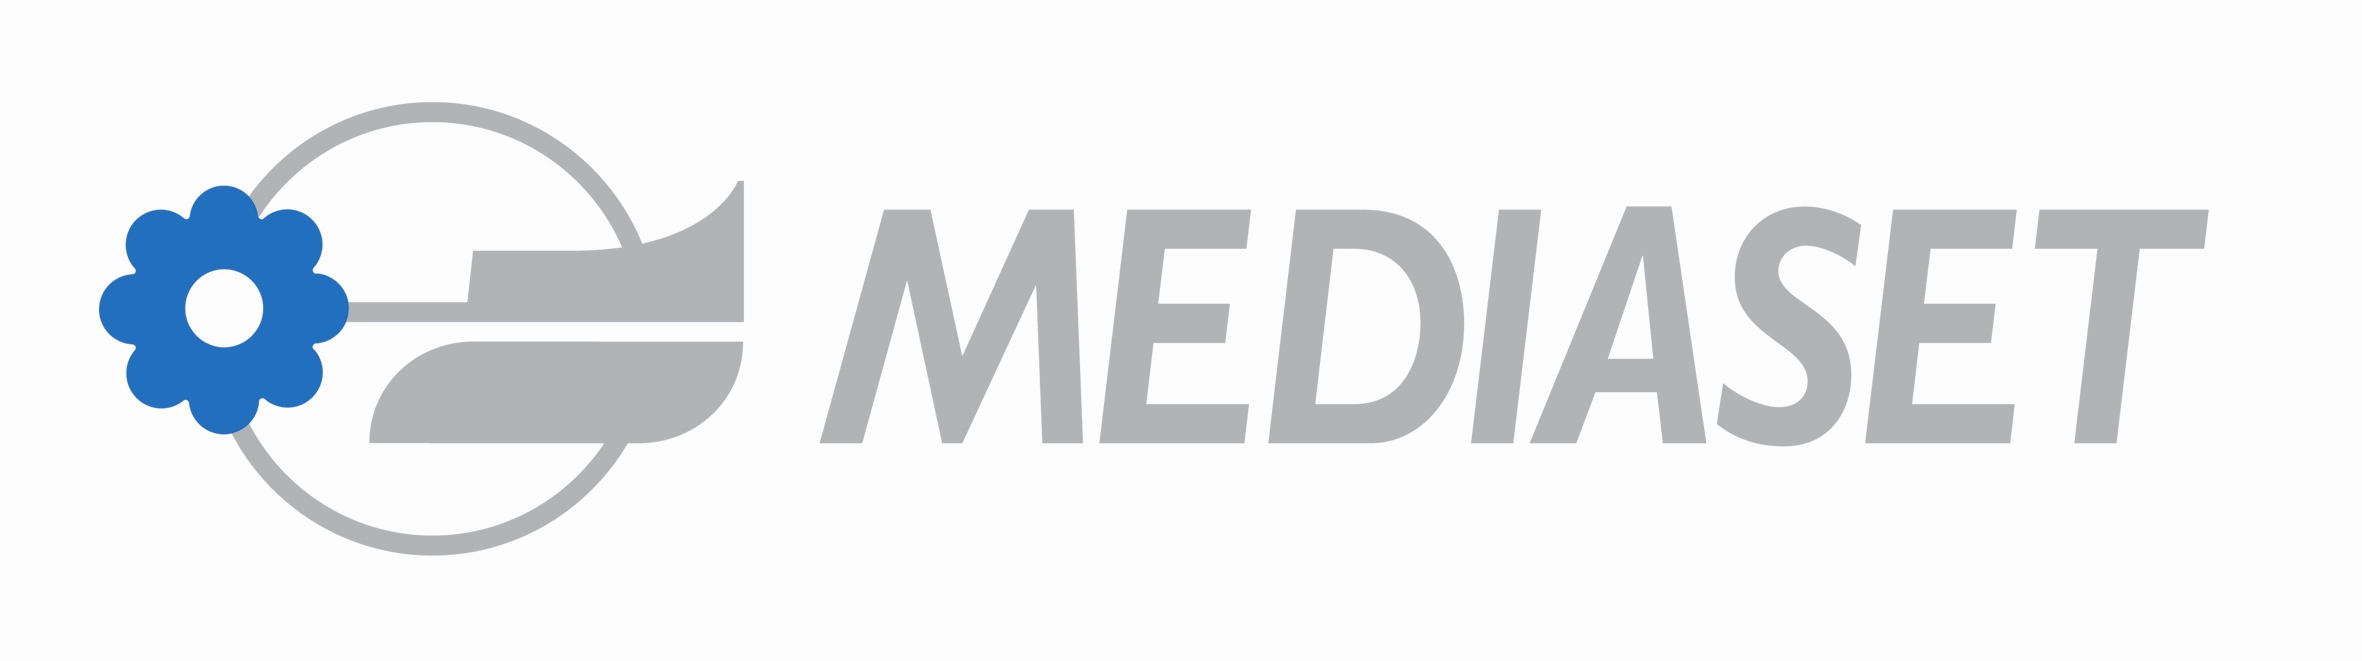 Mediaset (ADR) logo